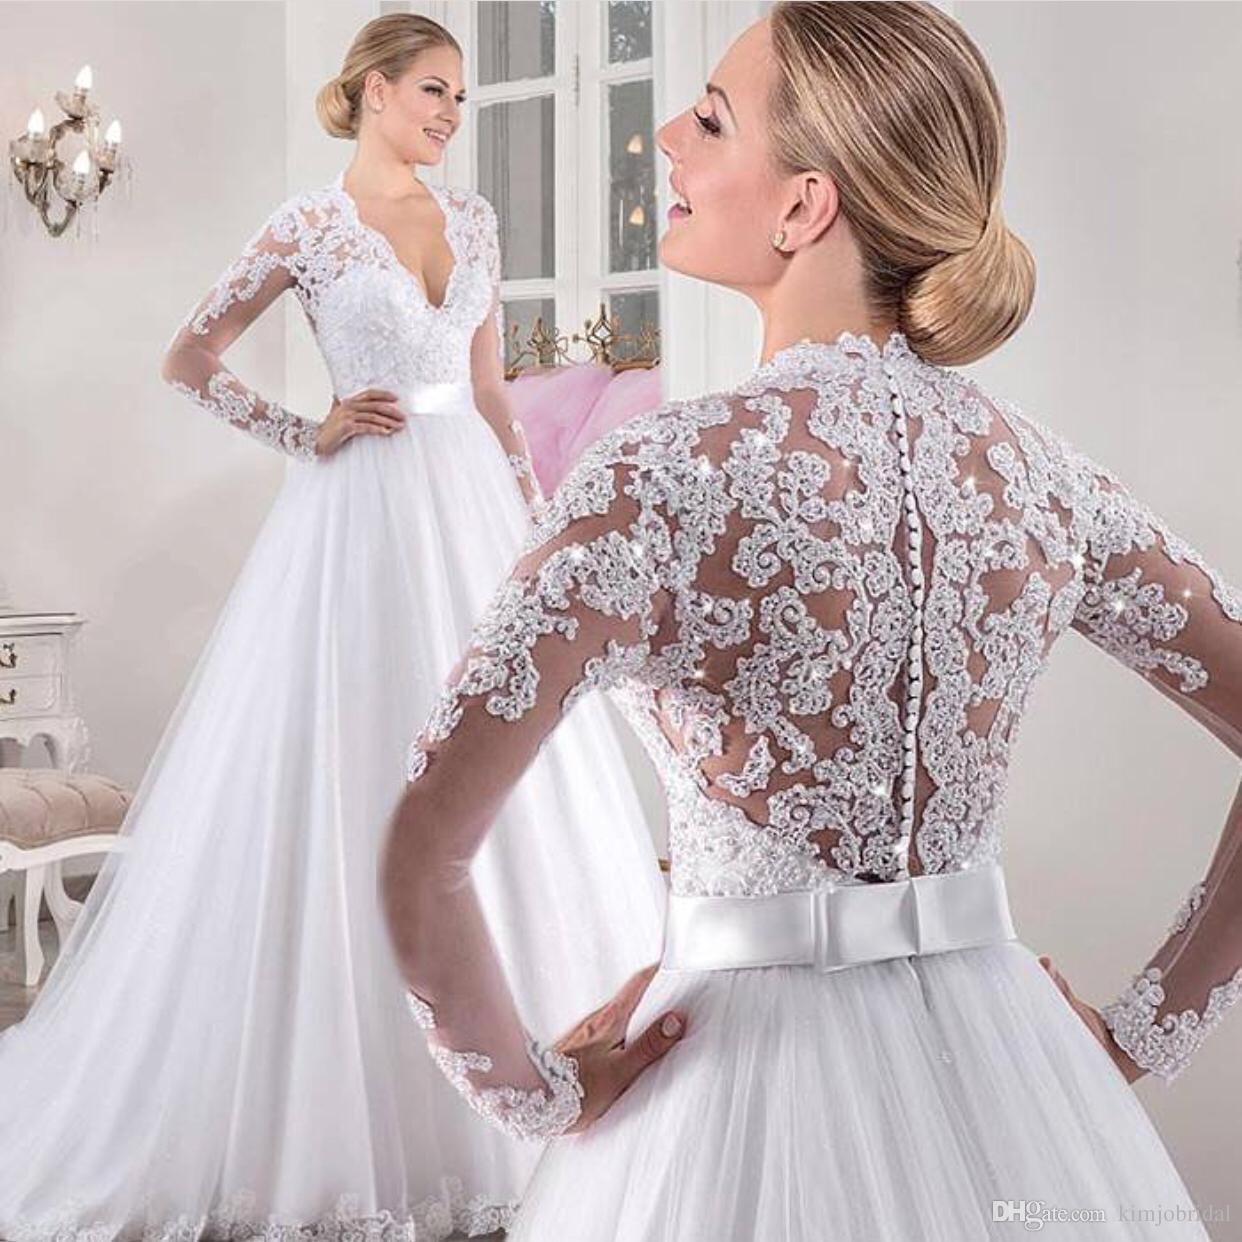 5ccd79aa4d1dd 2019 Long Sleeve Lace Wedding Dresses A Line Beaded White Elegant Wedding  Gown Bridal Dress Vestido De Noiva Wedding Dresses Couture Wedding Dresses  White ...